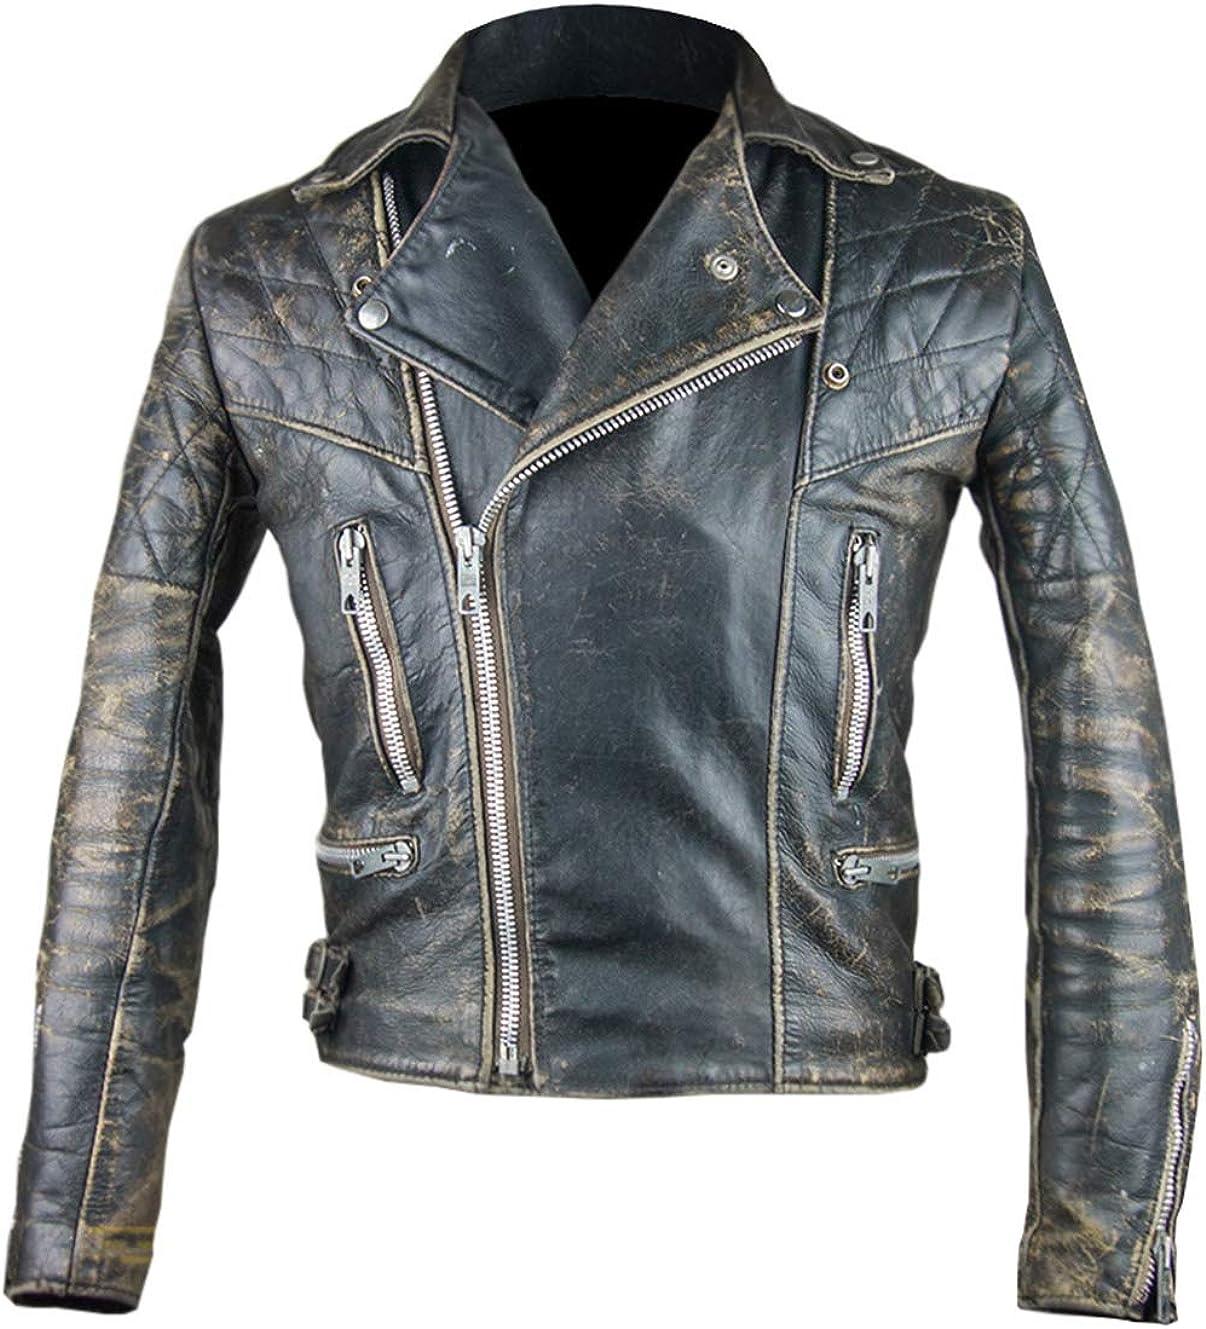 UGFashions Men's Antique Cafe Racer Motorcycle Retro Vintage Quilted Distressed Leather Biker Black Jacket